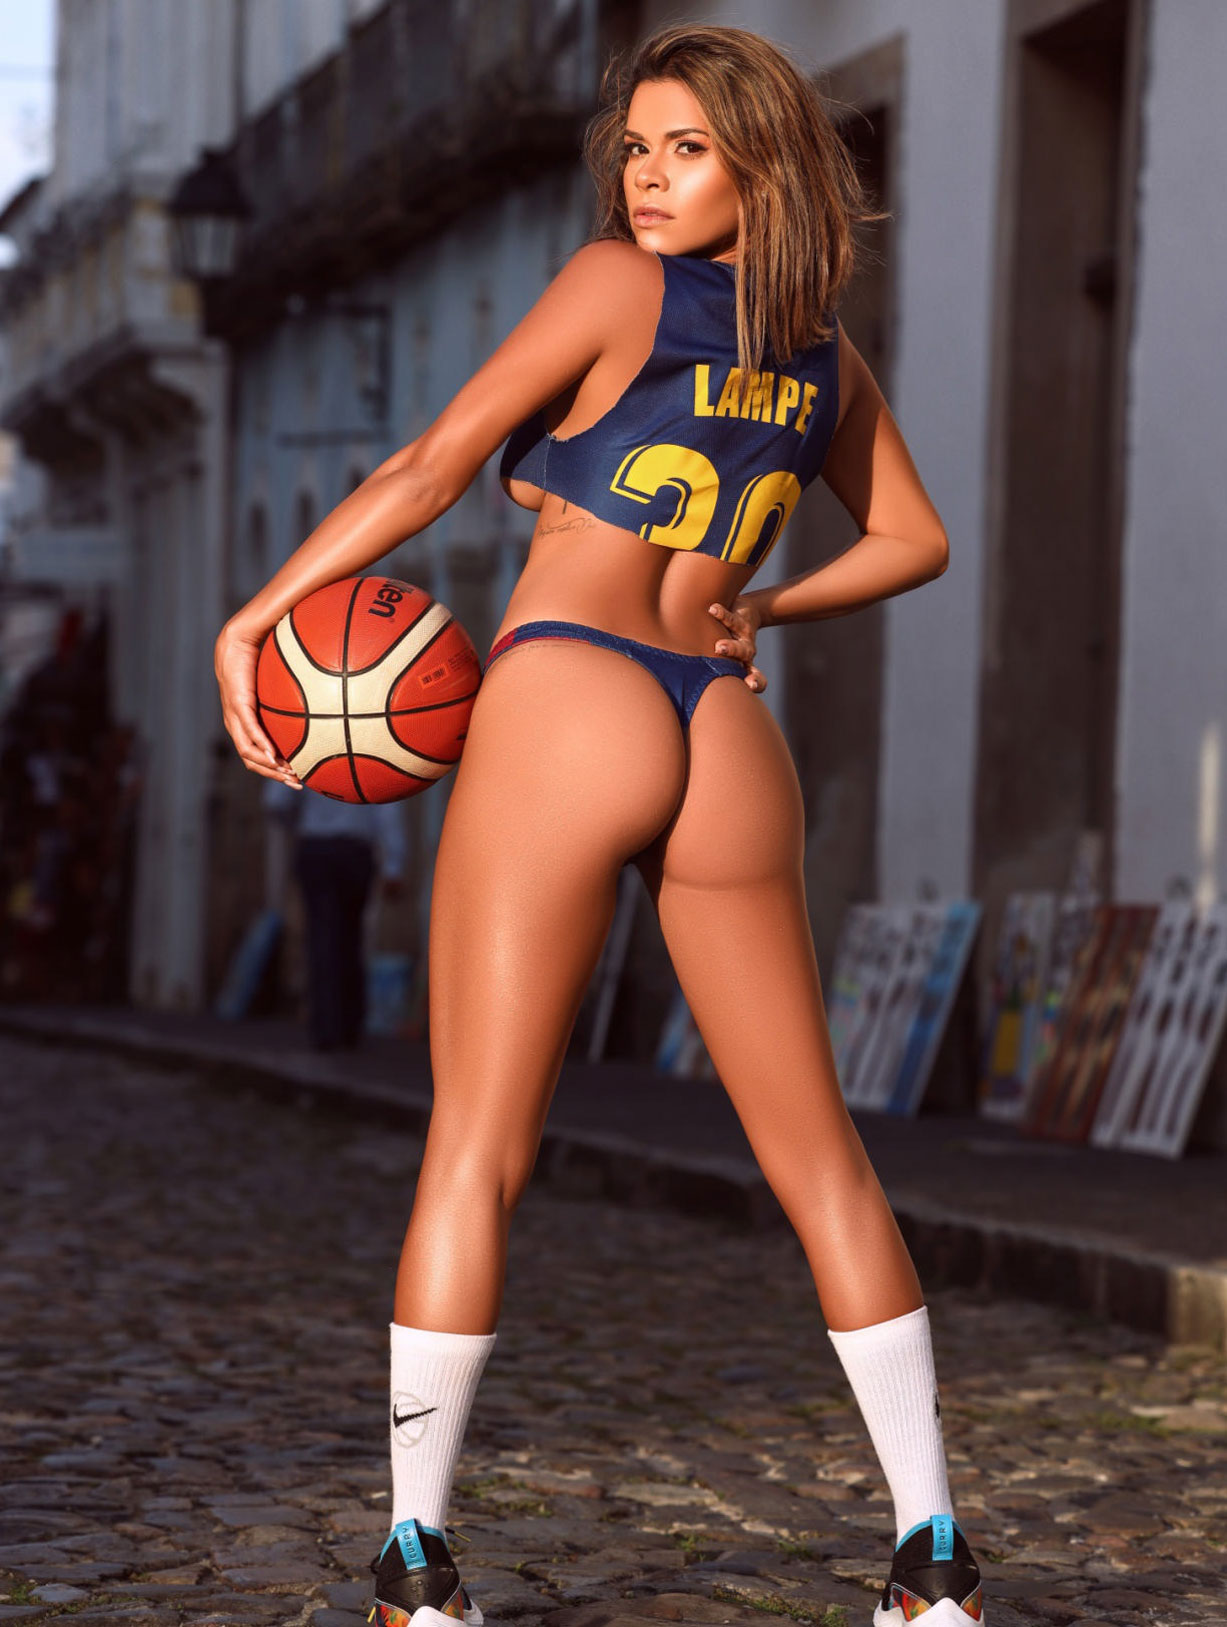 Луана Санден проводит разминку с баскетбольным мячом / фото 07